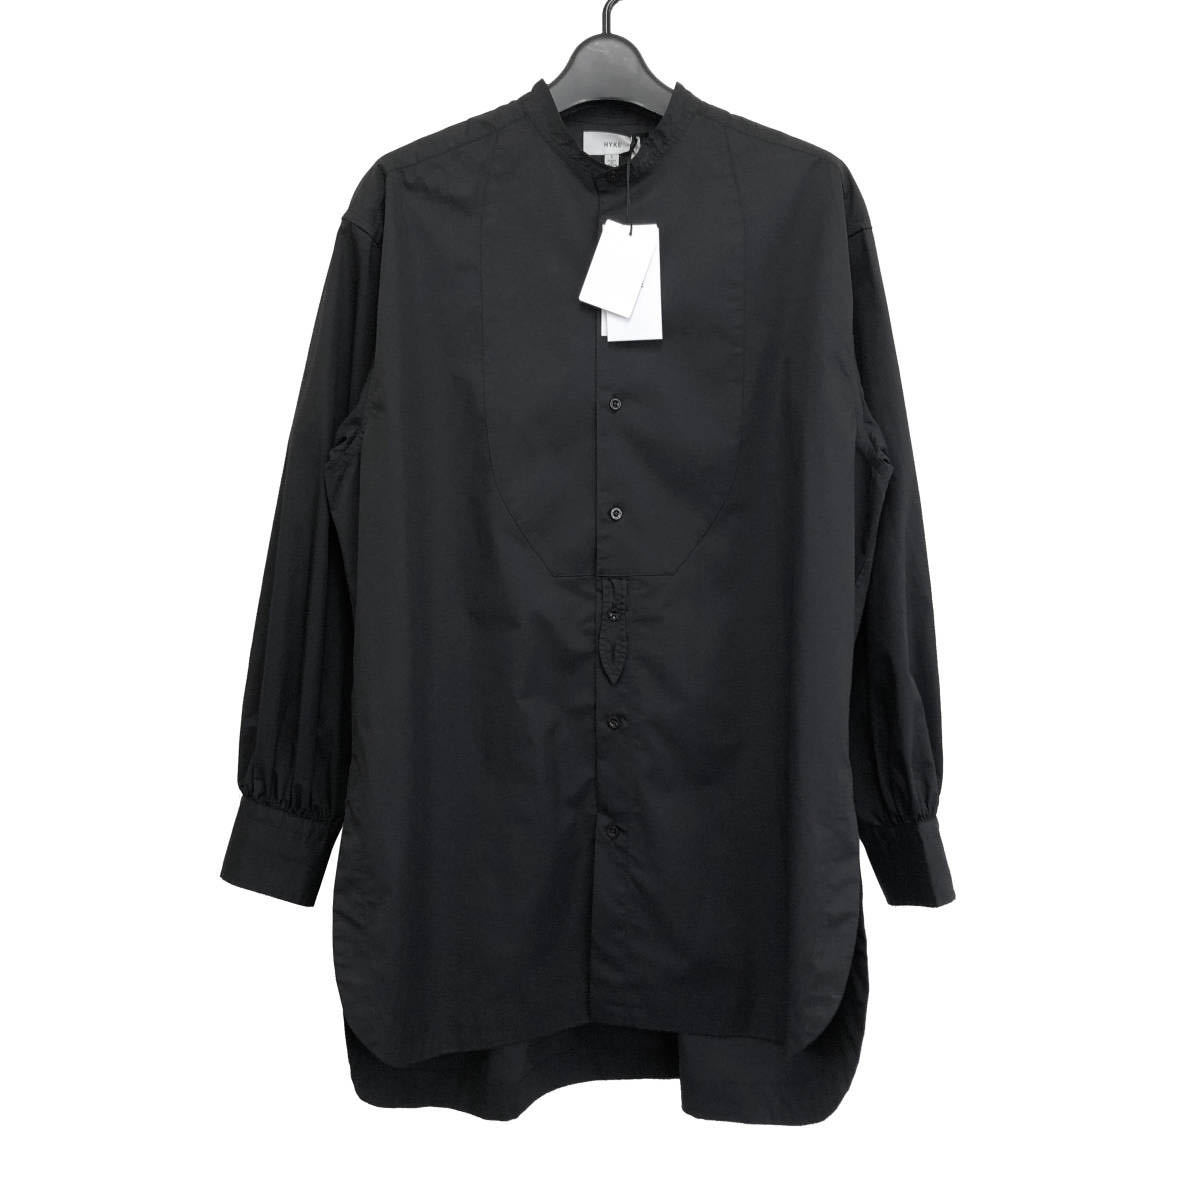 HYKE ハイク 20SS TC BIB FRONT SHIRT ビブフロントシャツ 15105